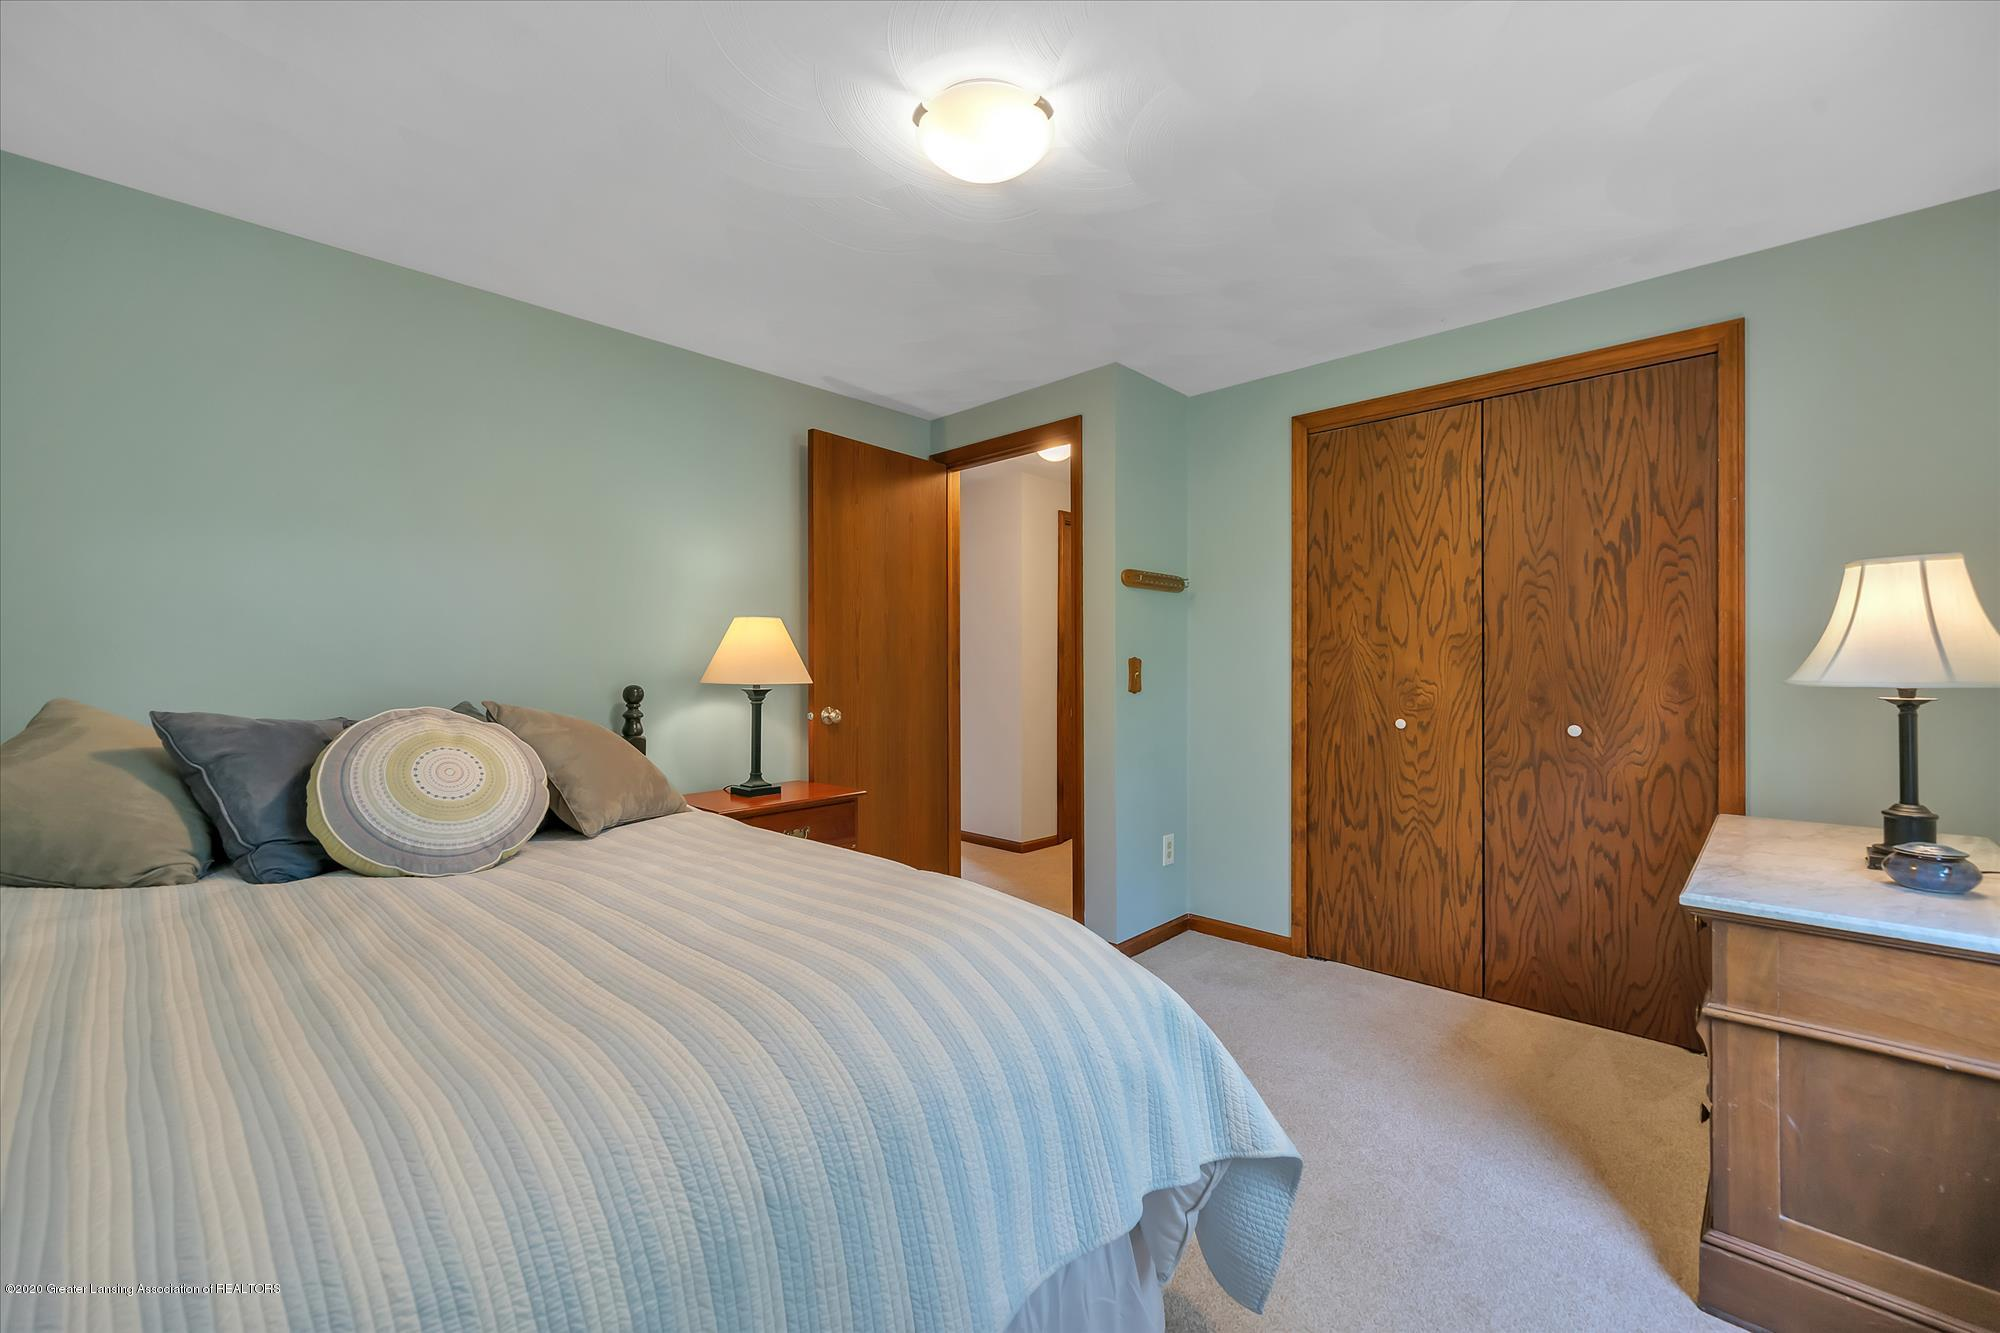 1606 Birchwood Dr - Bedroom 2 - 19